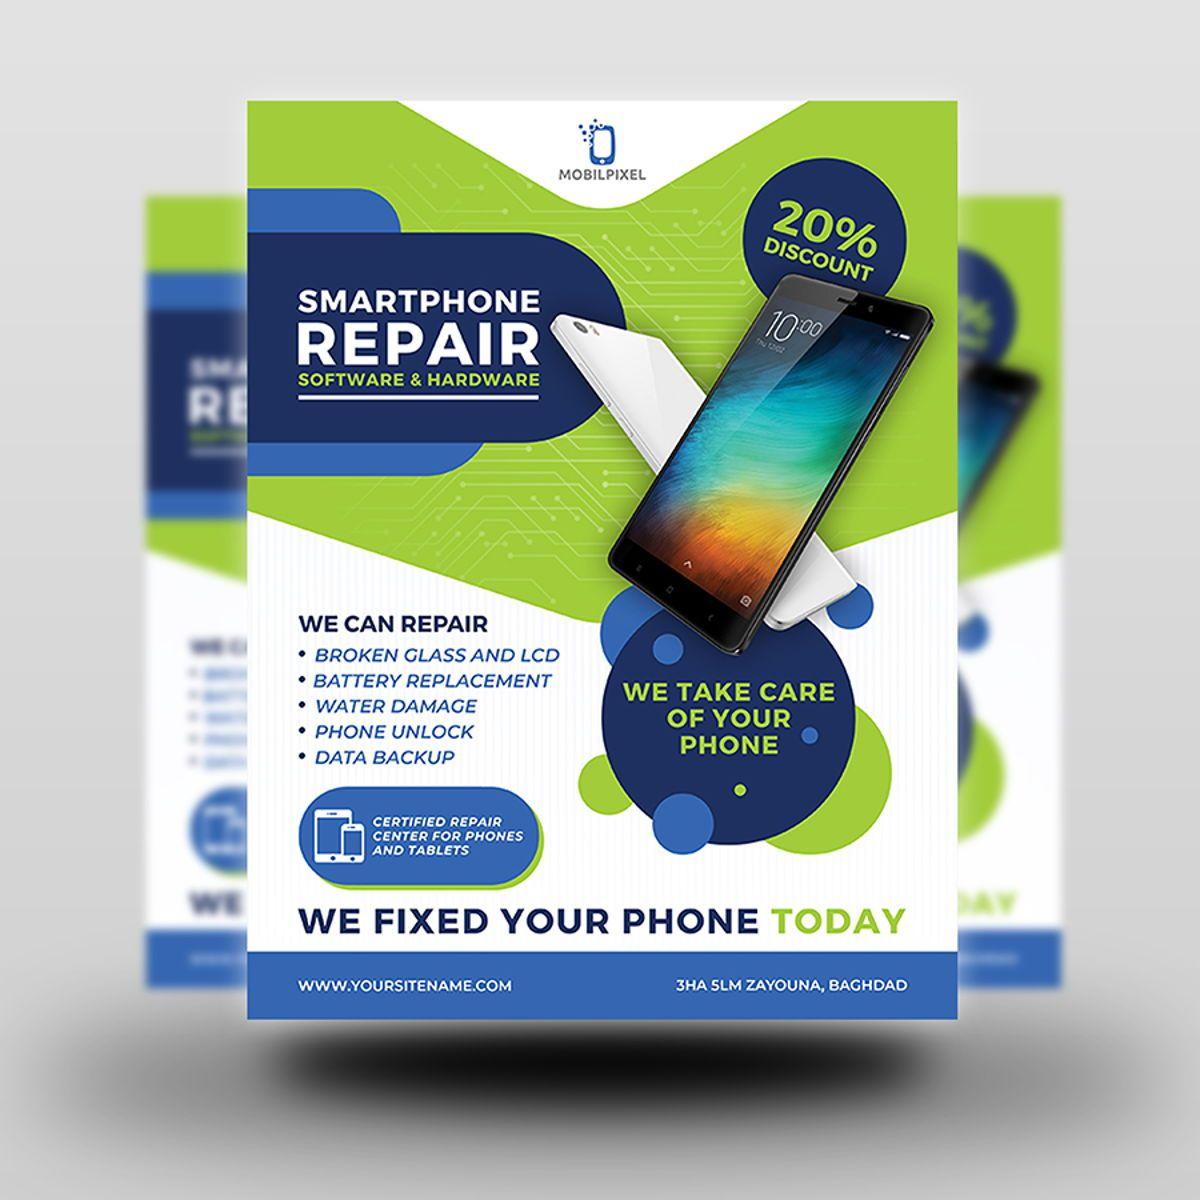 Smartphone Repair Service Flyer Template, Slide 2, 08496, Telecommunication — PoweredTemplate.com